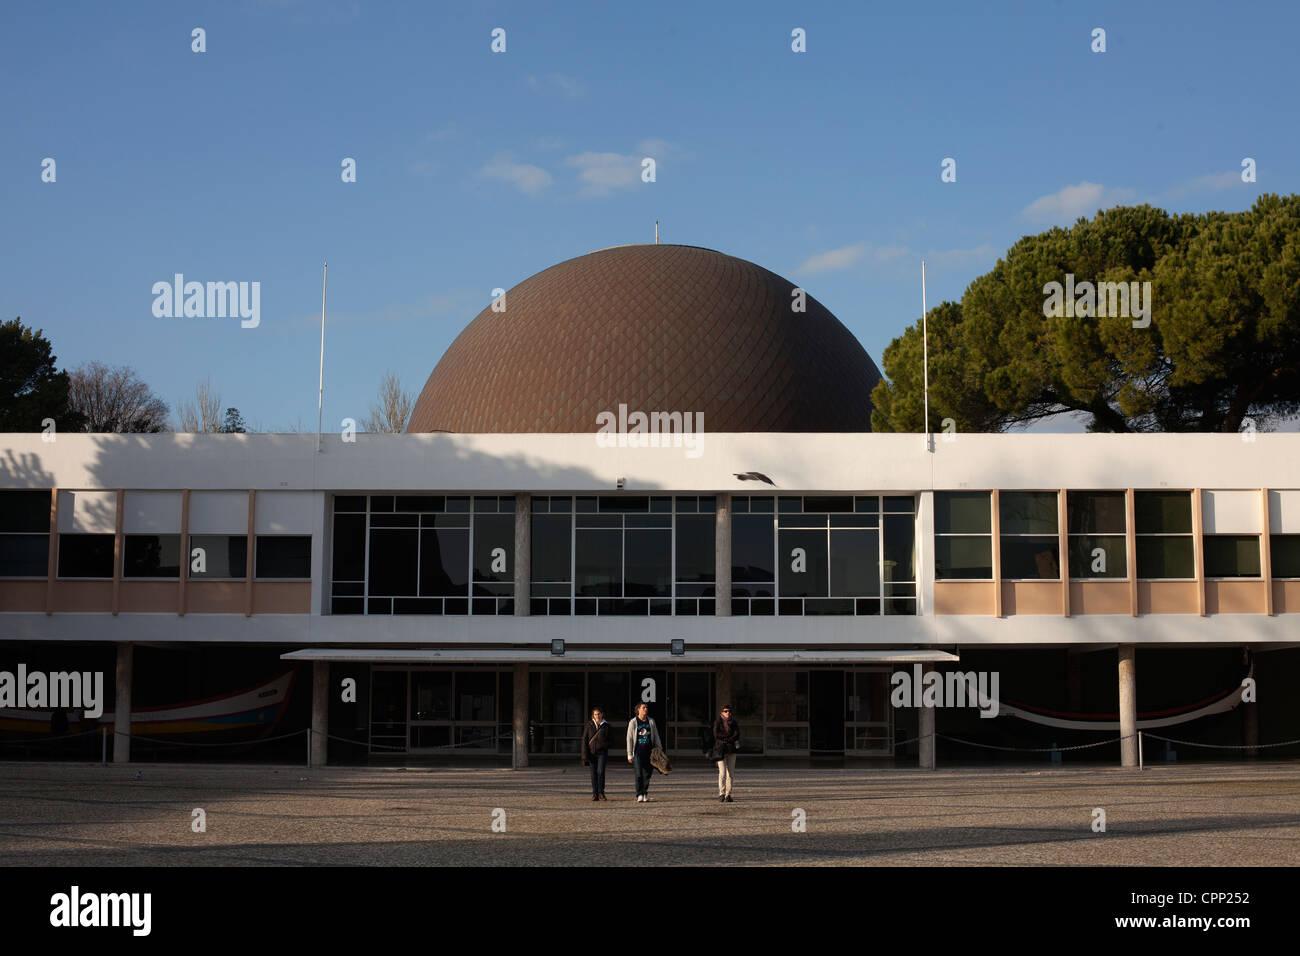 The Calouste Gulbenkian Planetarium, Lisbon, Portugal. - Stock Image